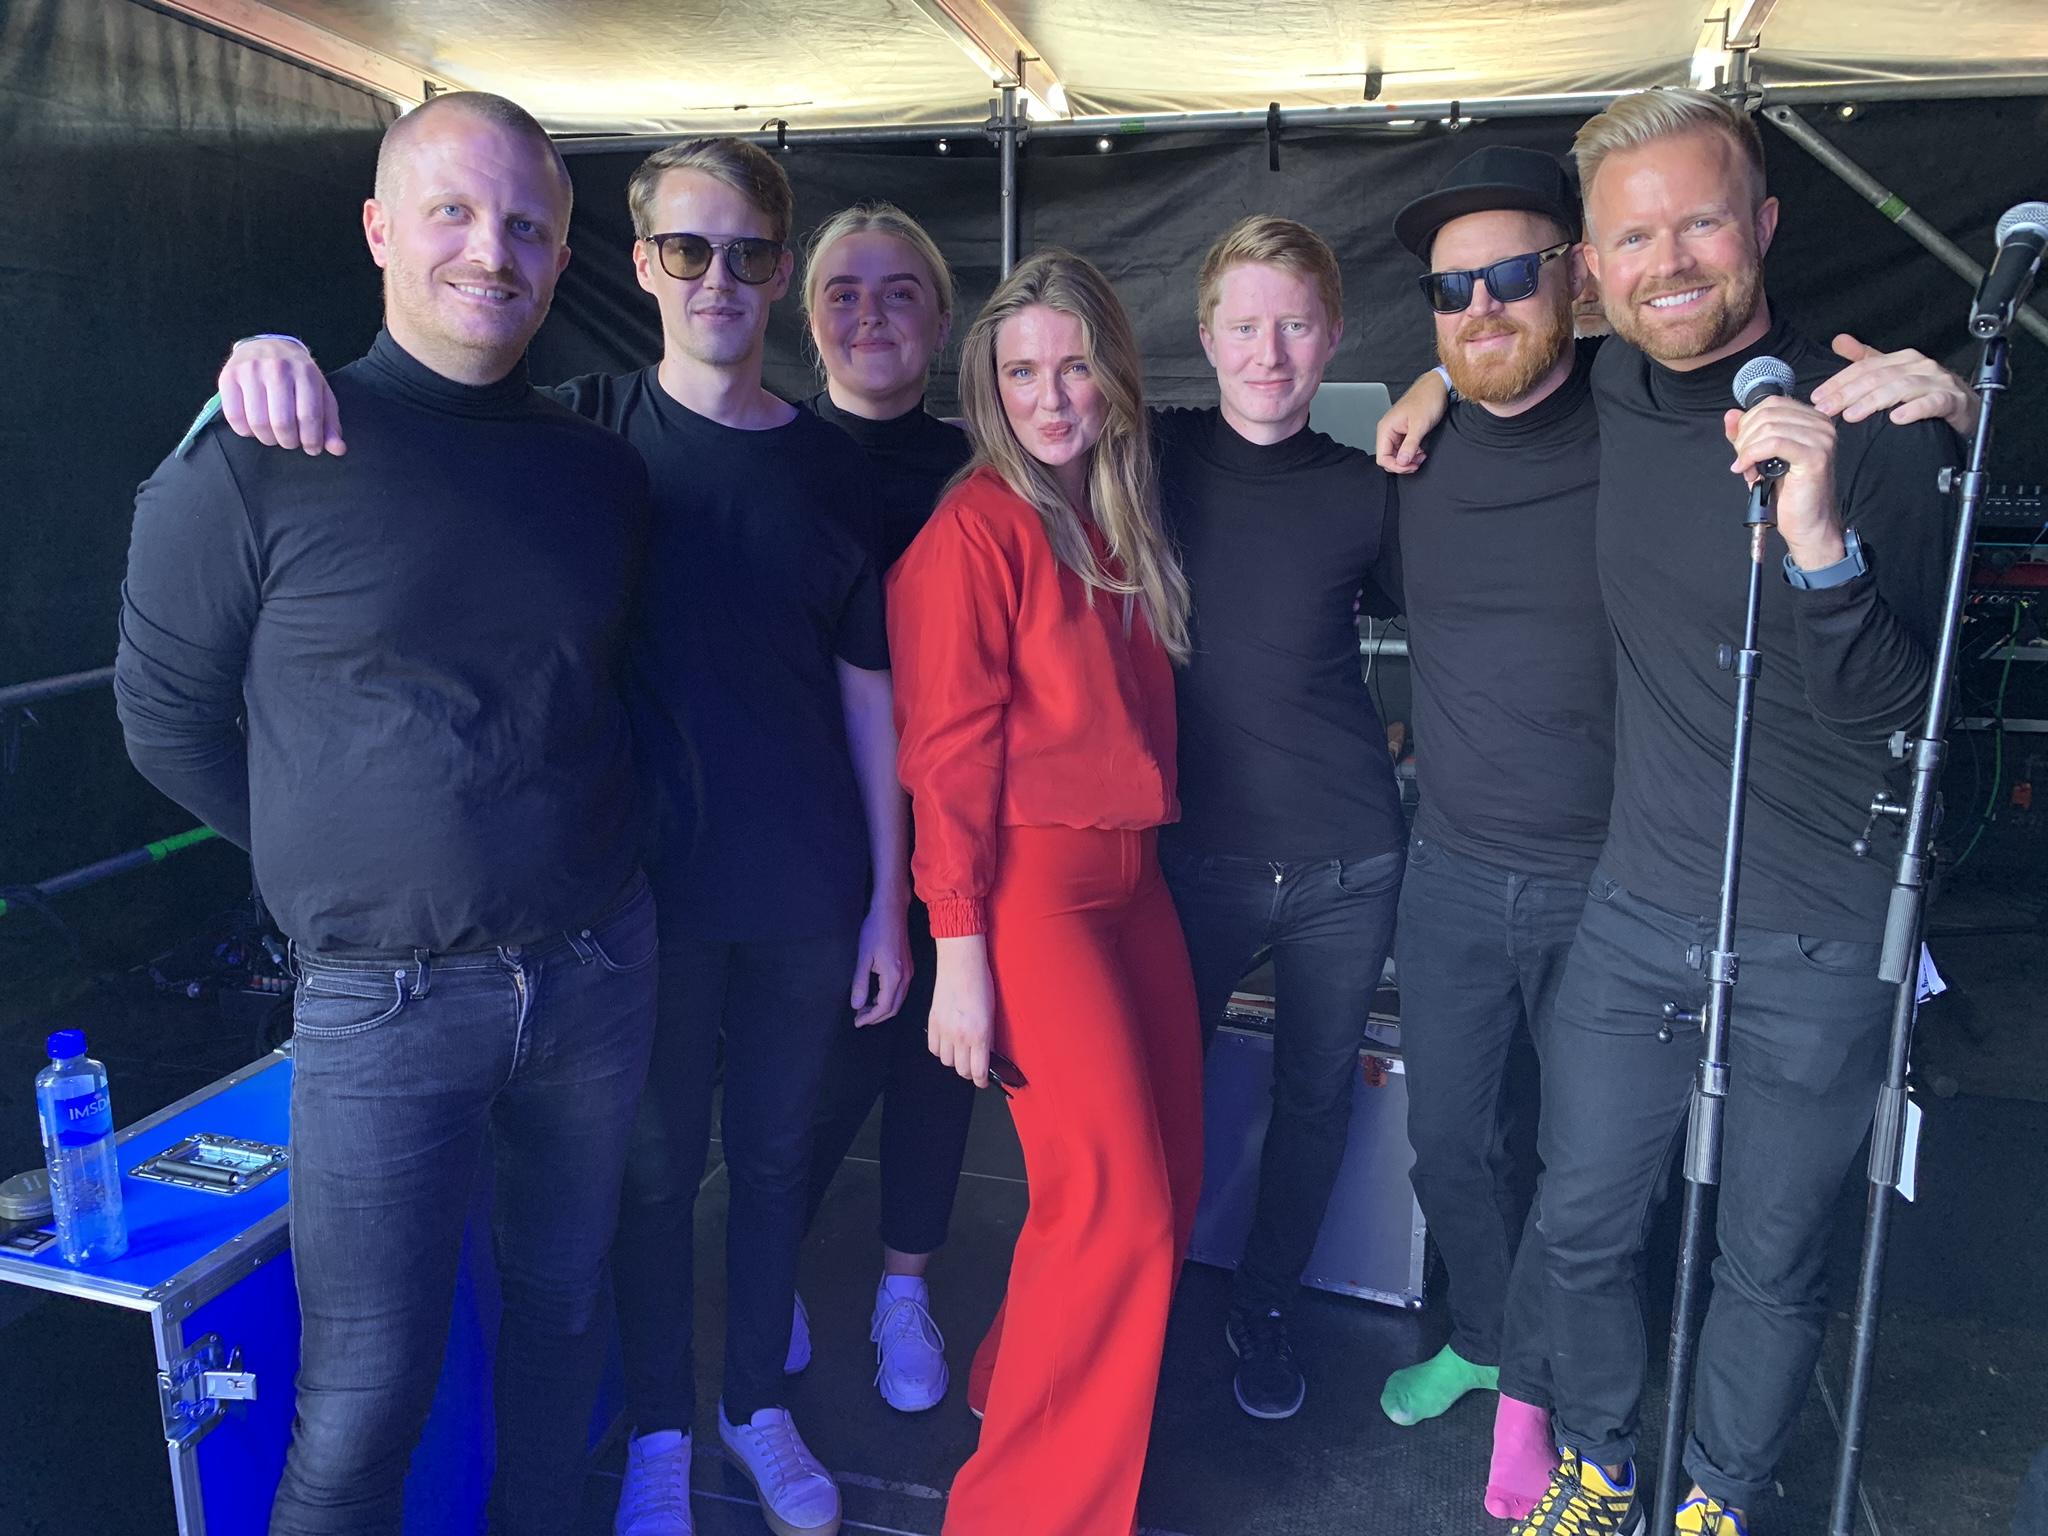 Melis spilte på Fjordfesten 2019 i Sandefjord, lørdag 3.august!